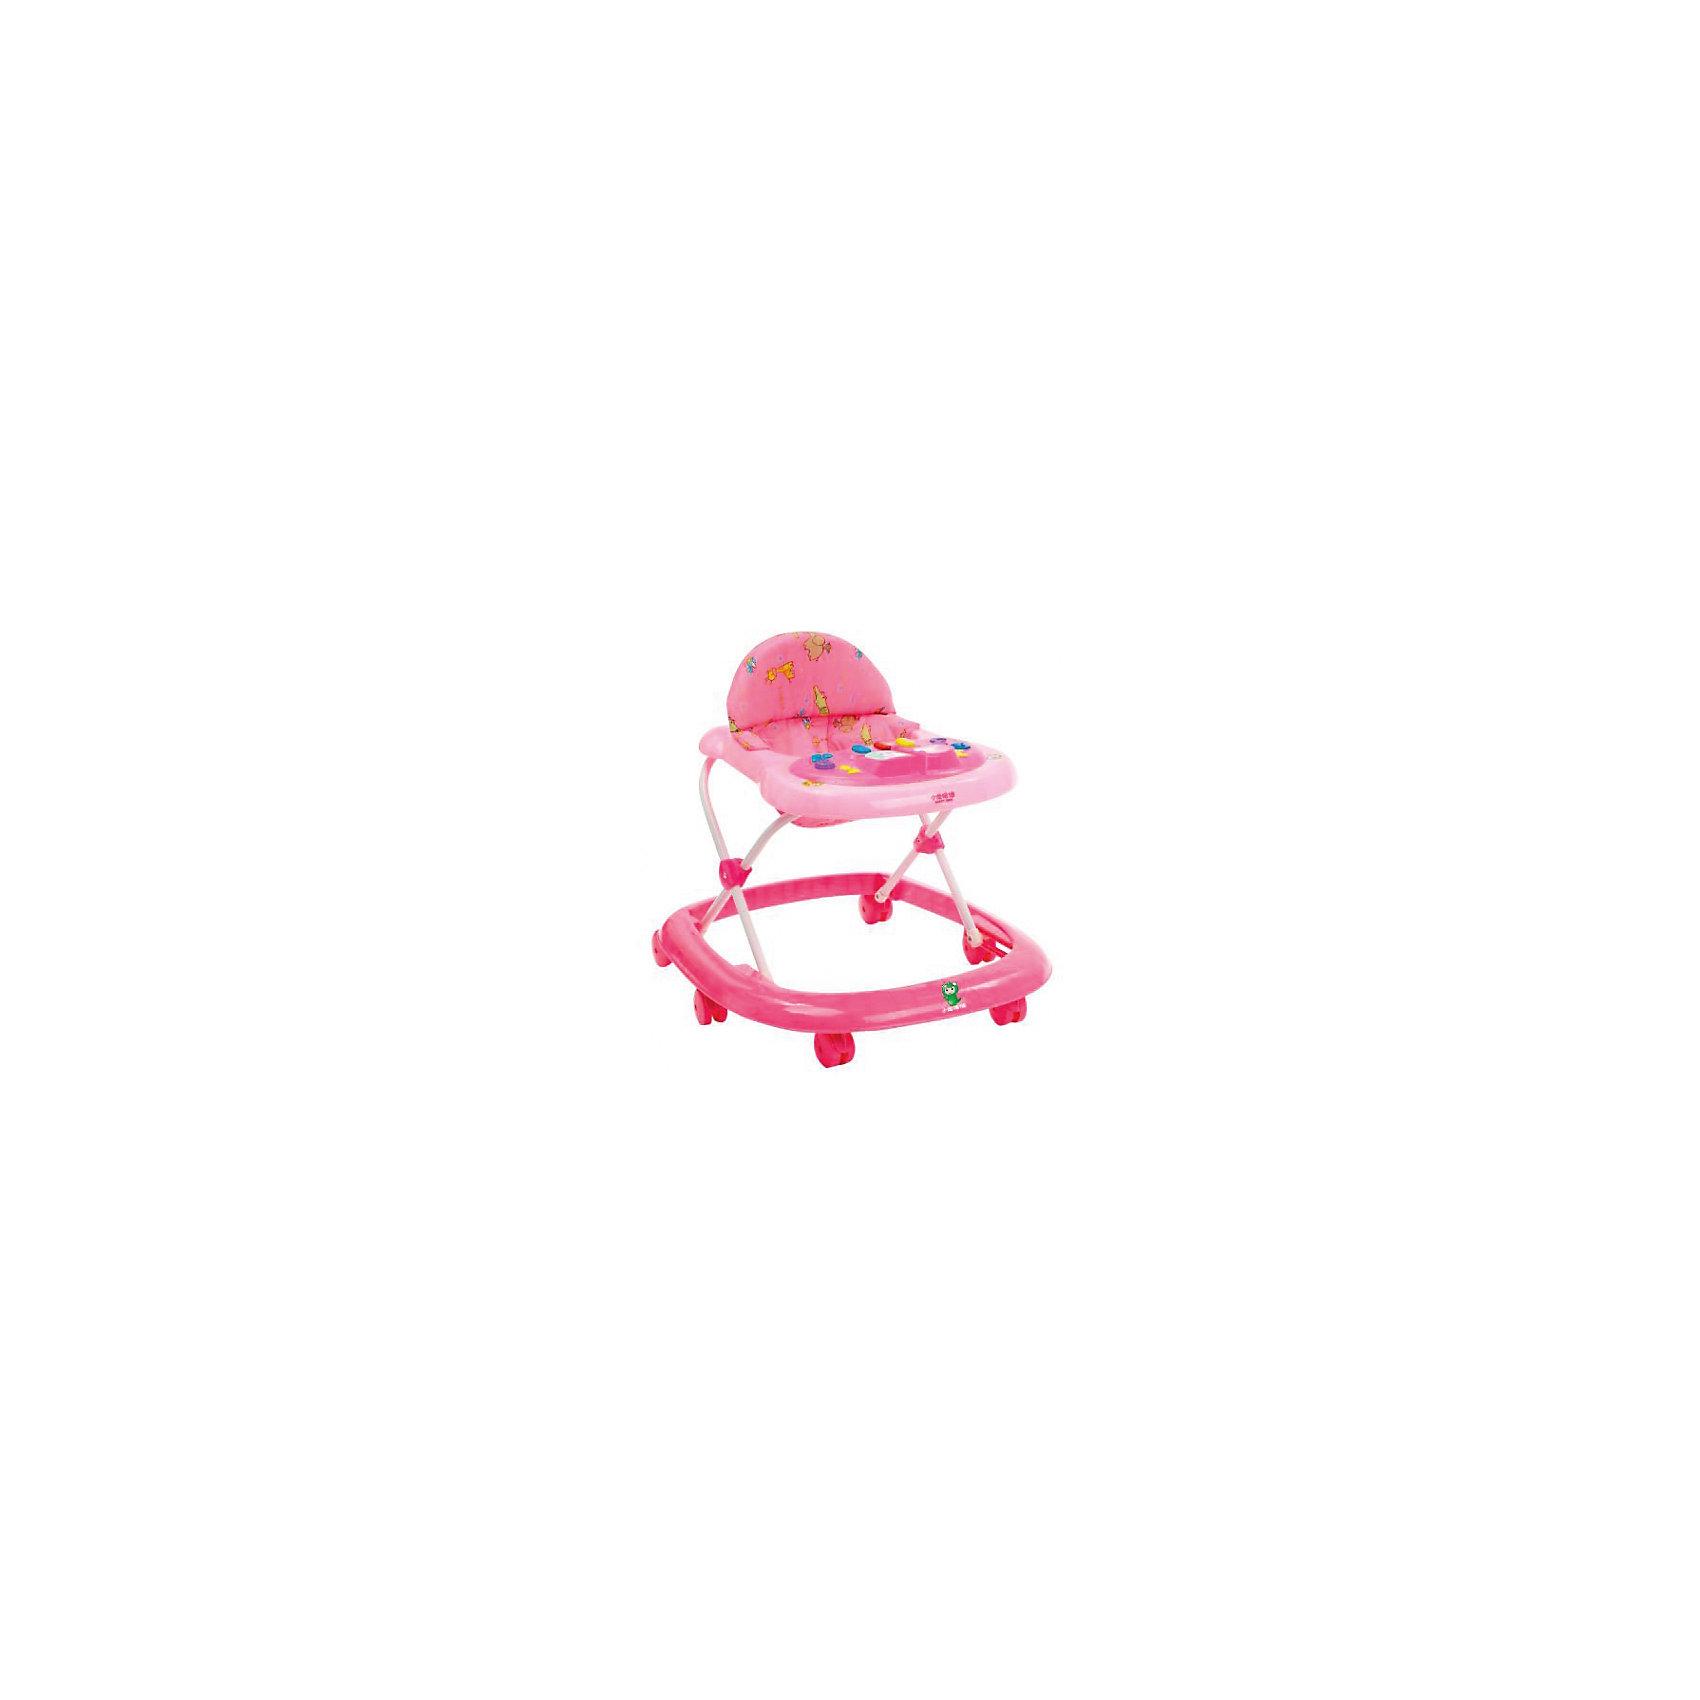 Ходунки LXB103H H382PP, Happy Dino, розовый